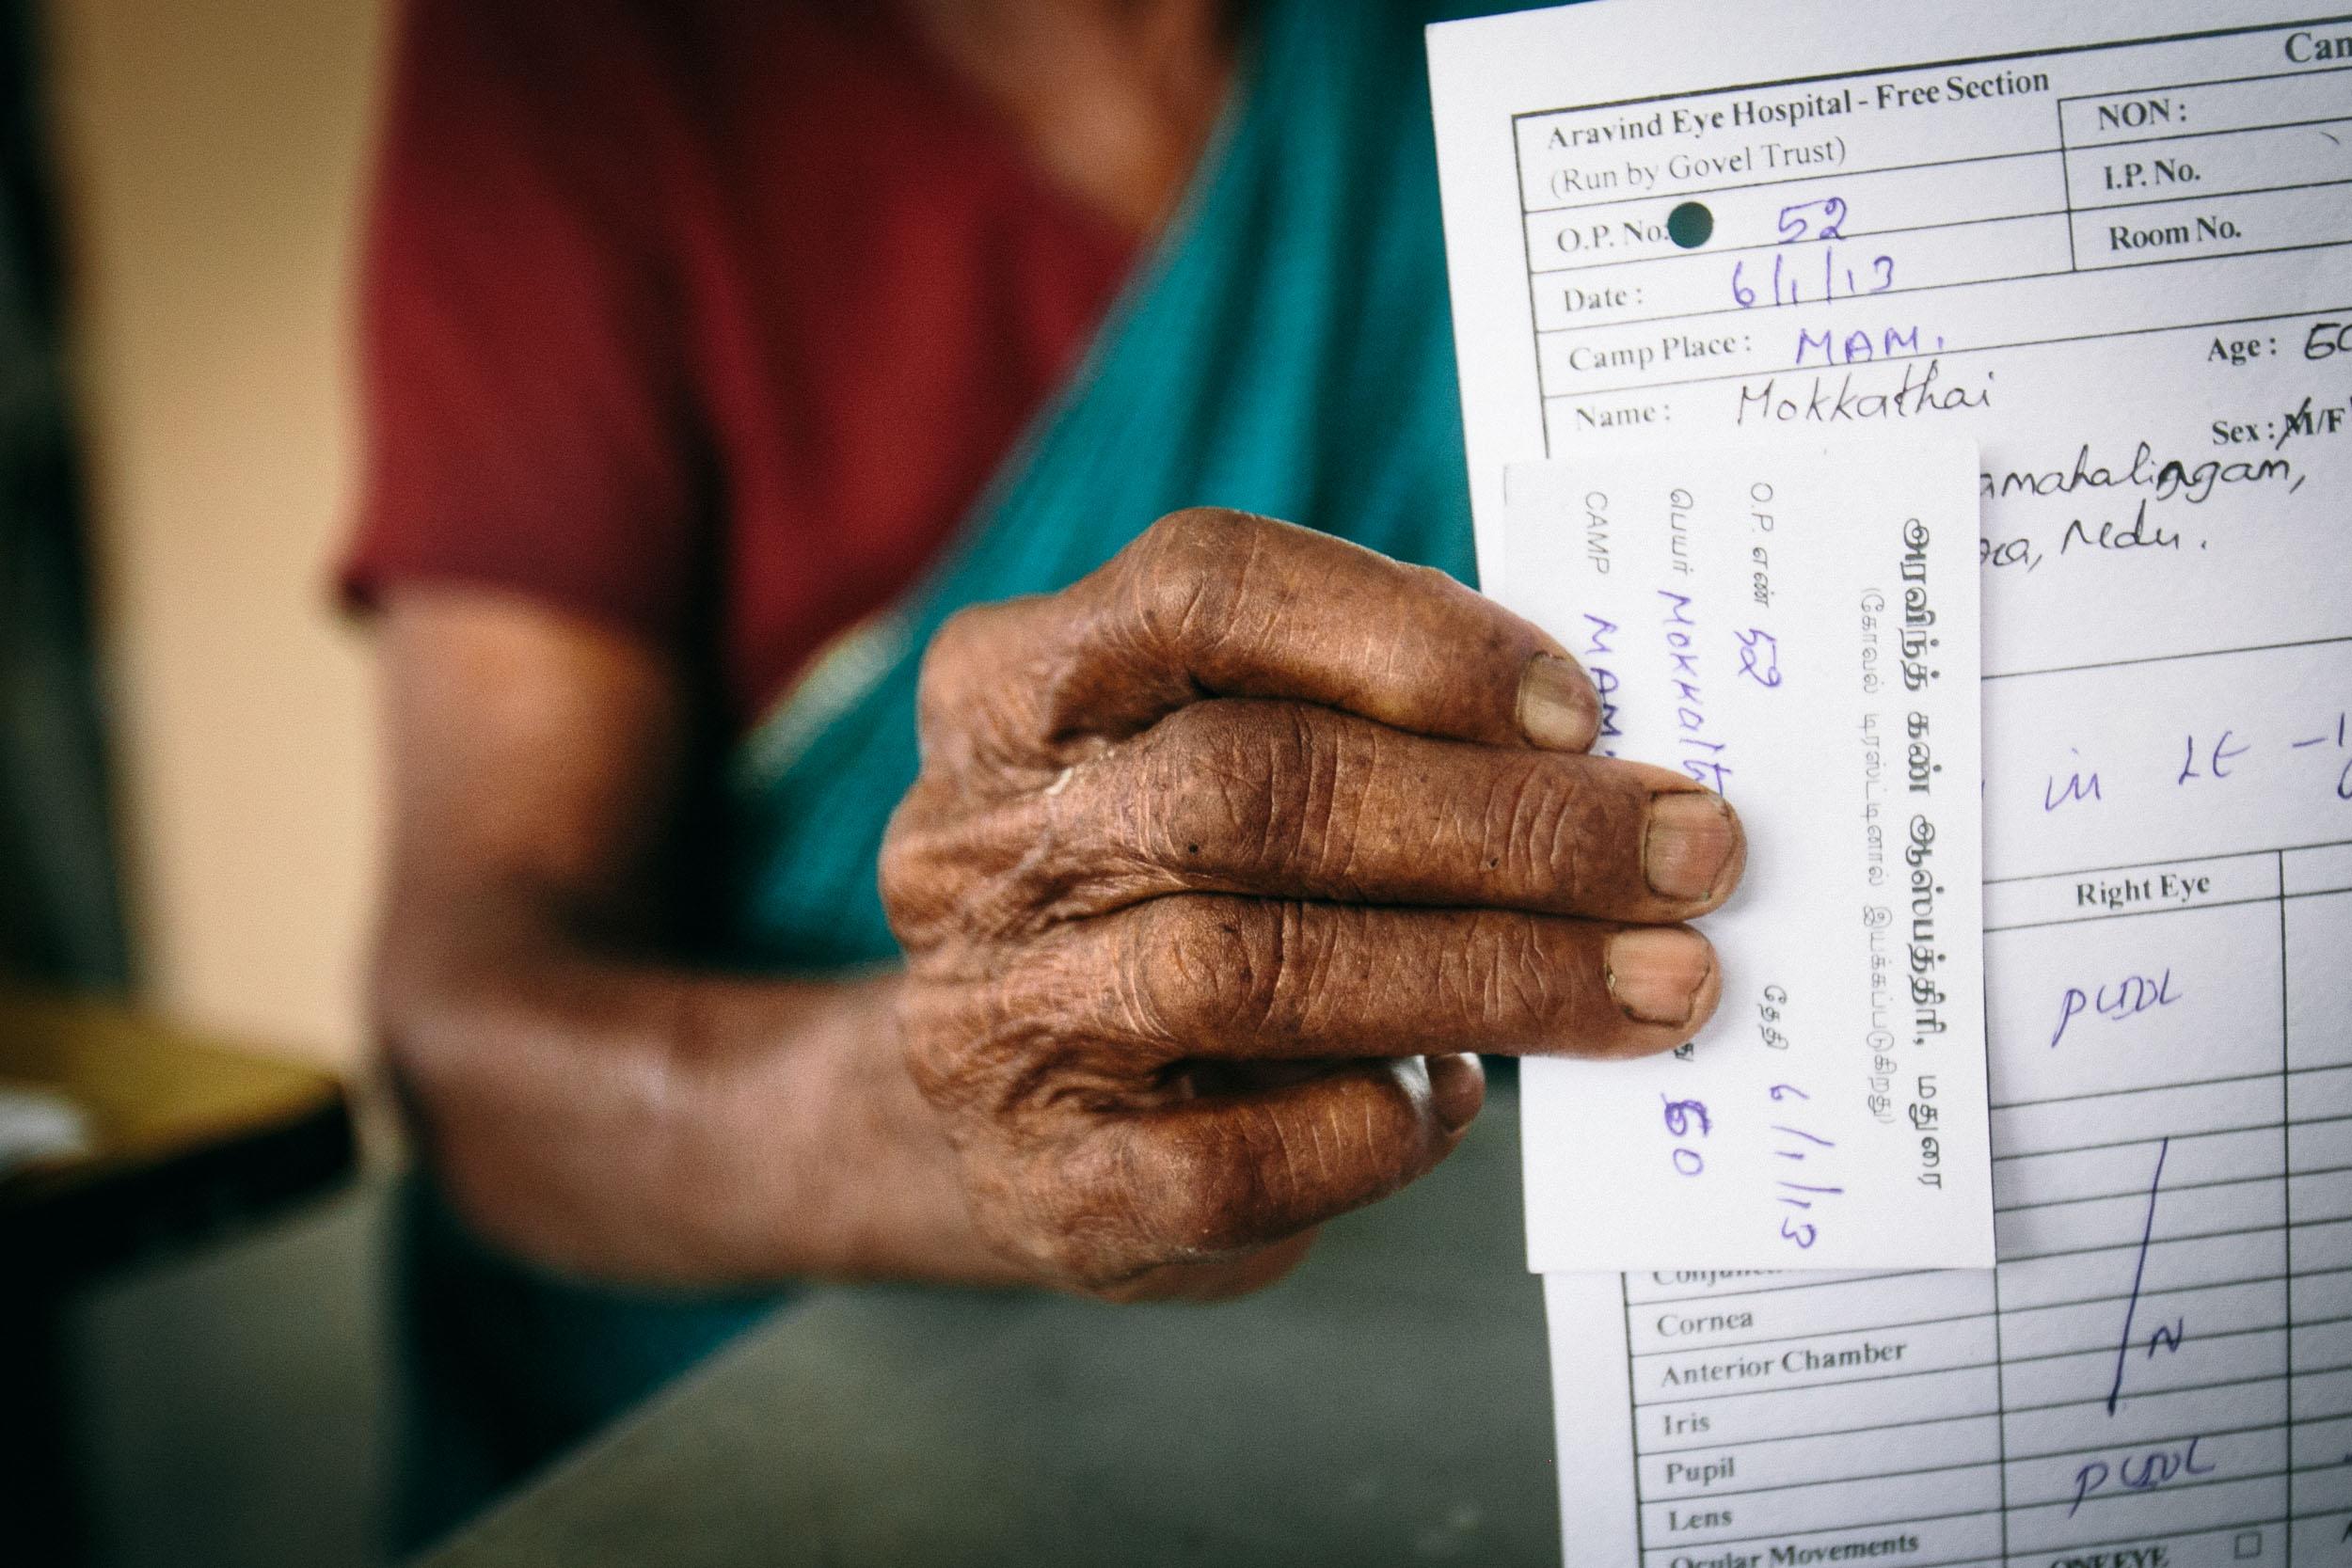 brian-callaway-india-photography-aravind-eye-hospital-09.jpg